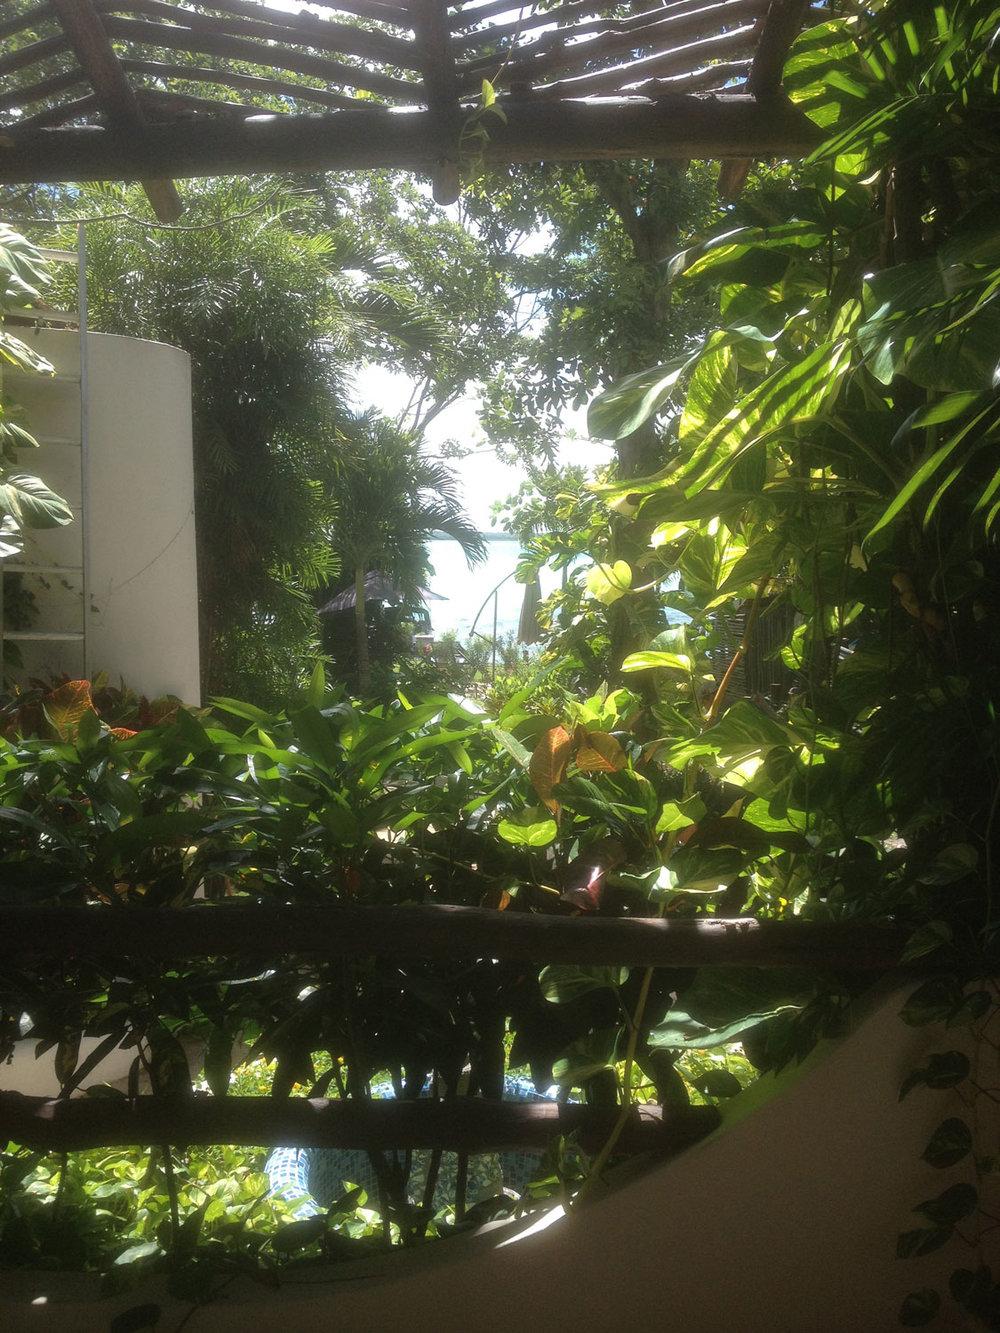 Hammocks_and_Ruins_Blog_Riviera_Maya_Mexico_Travel_Discover_Yucatan_What_to_do_Hacienda_Ochil_28.jpg